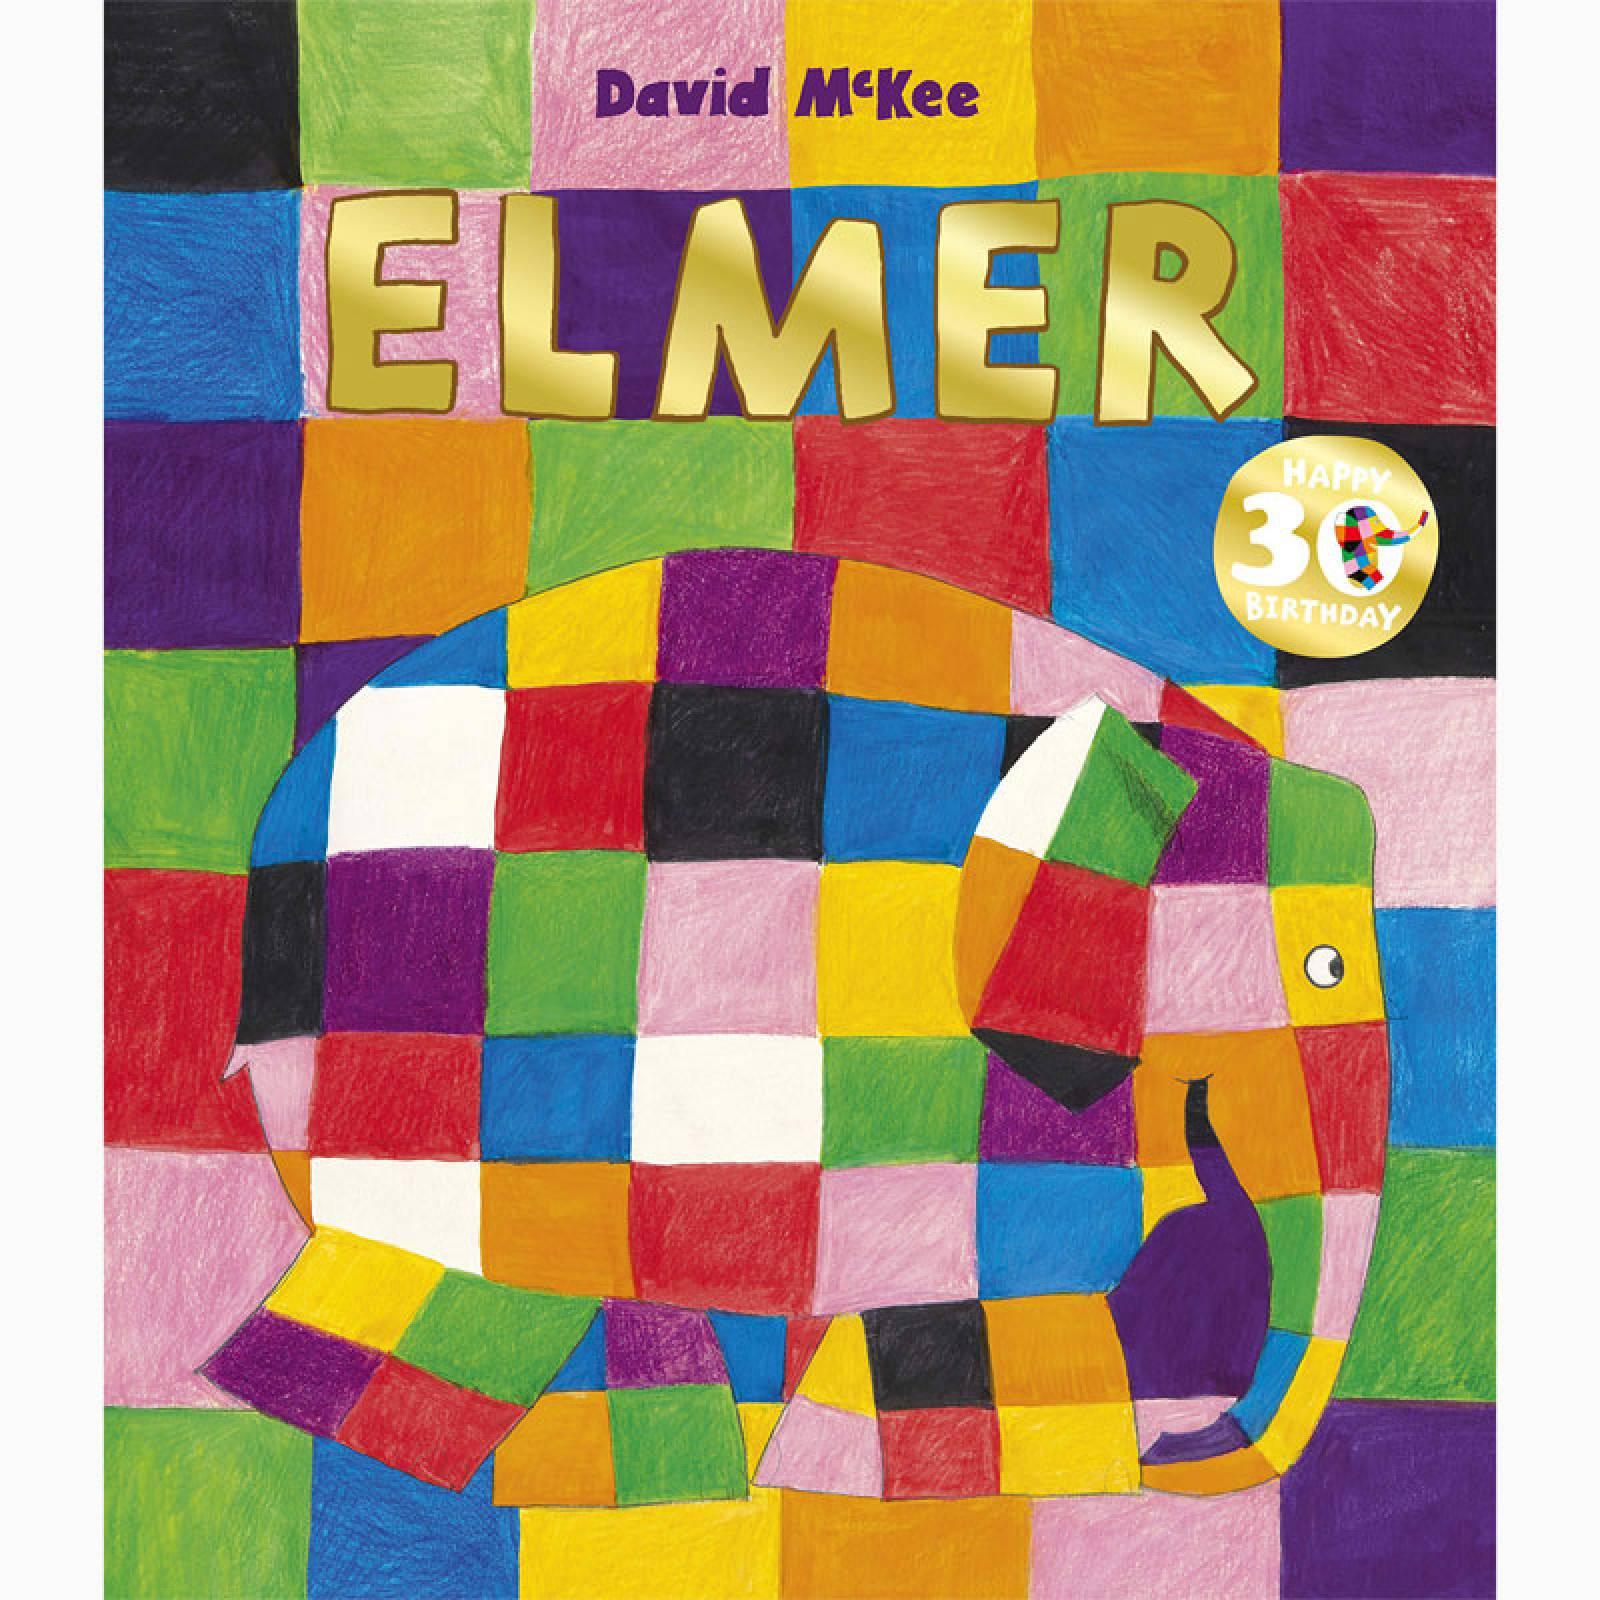 Elmer By David McKee - Paperback Book